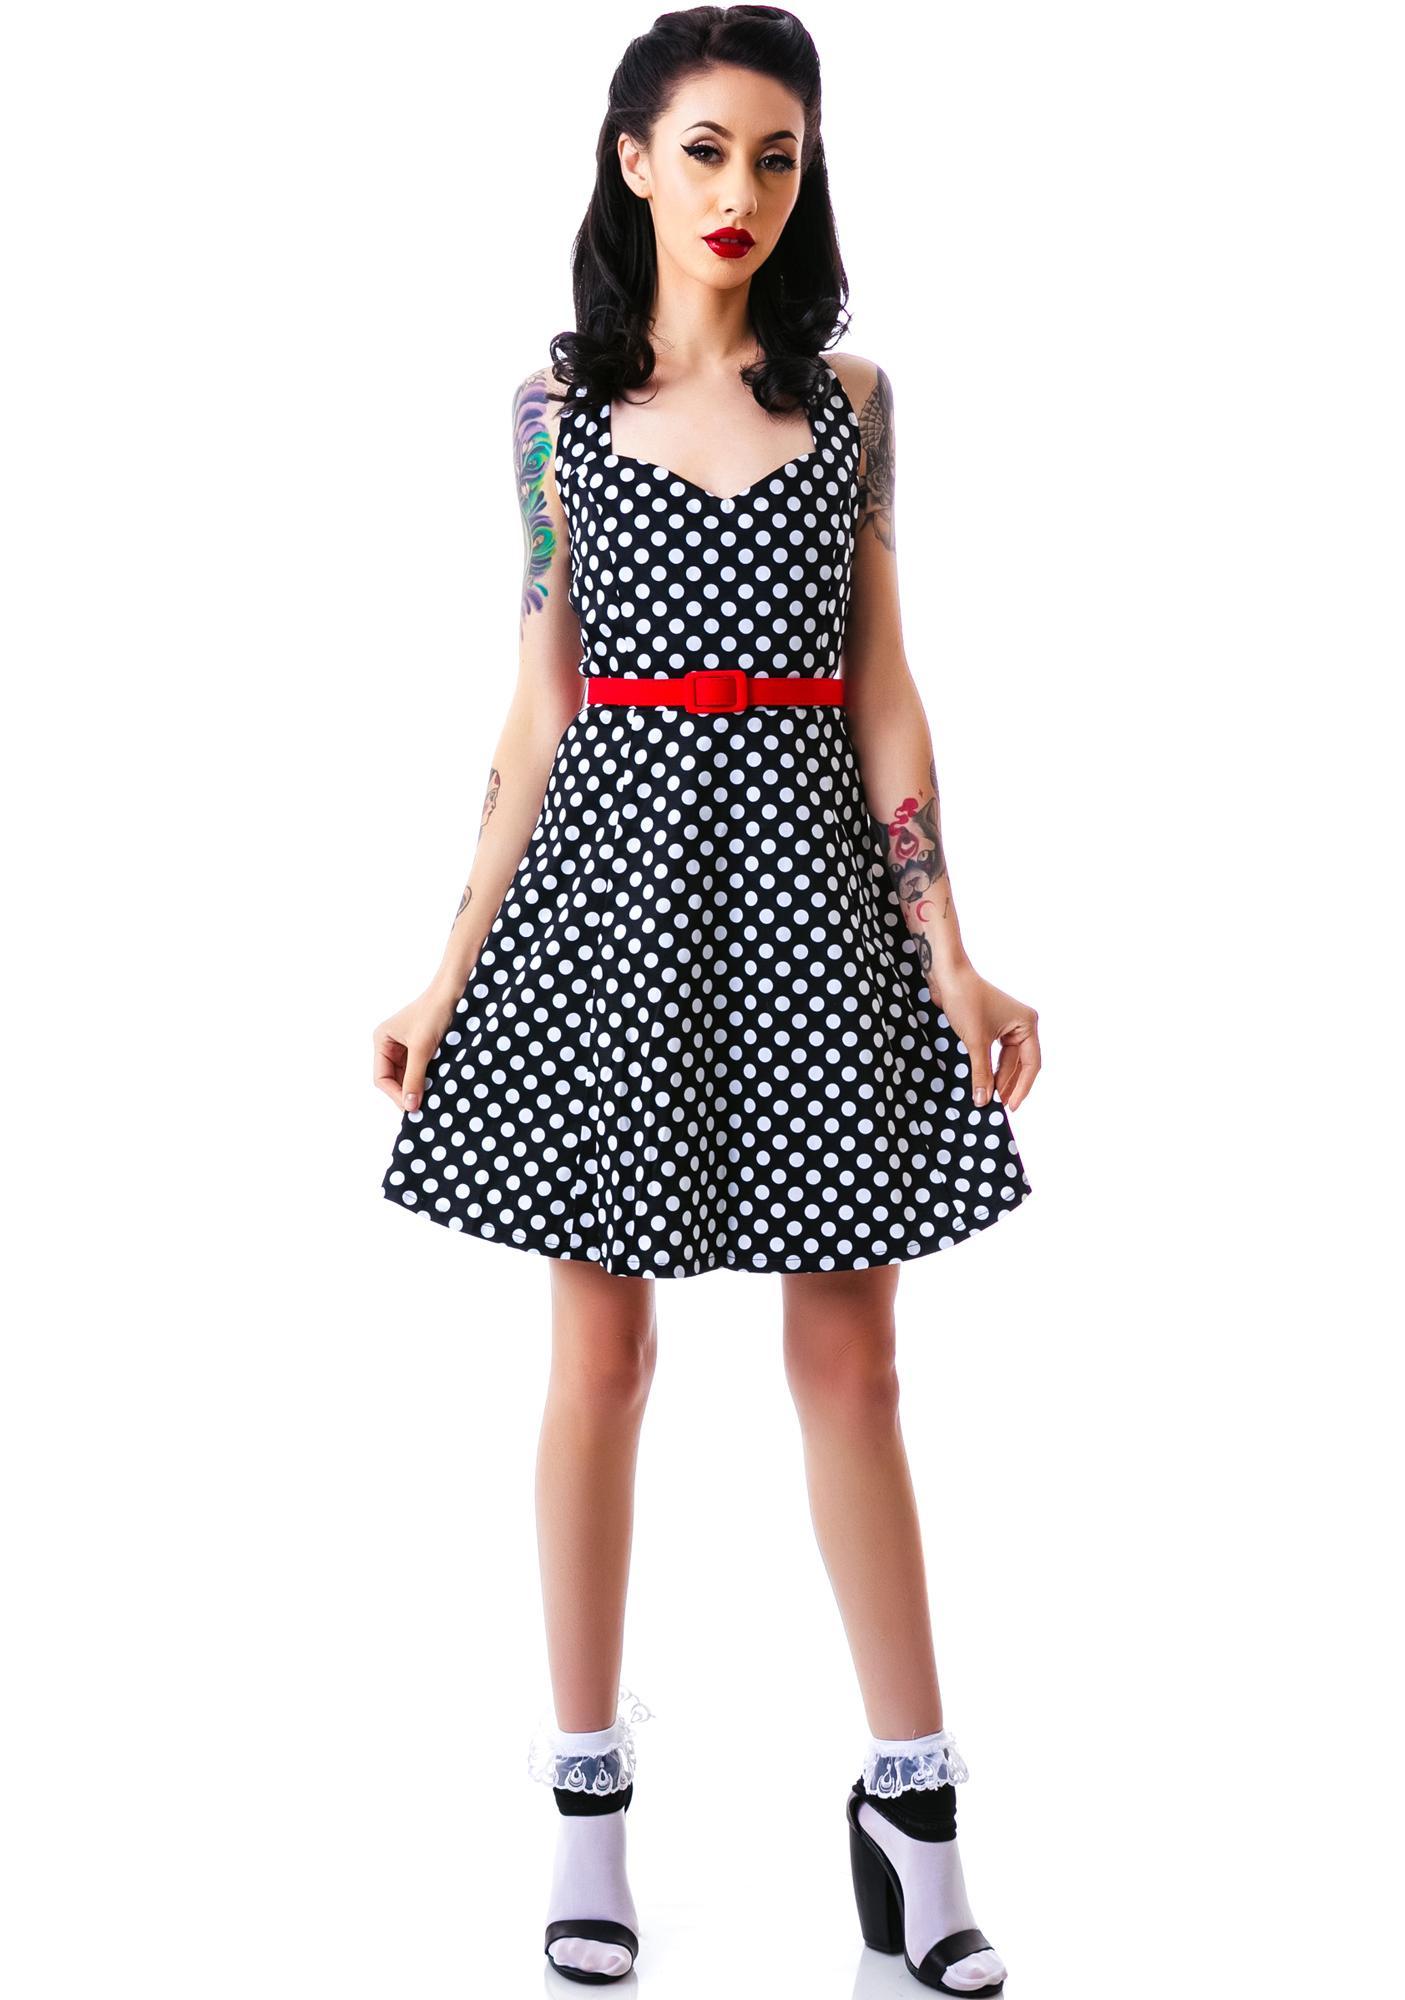 Sourpuss Clothing Flozzy Polka Dot Dress